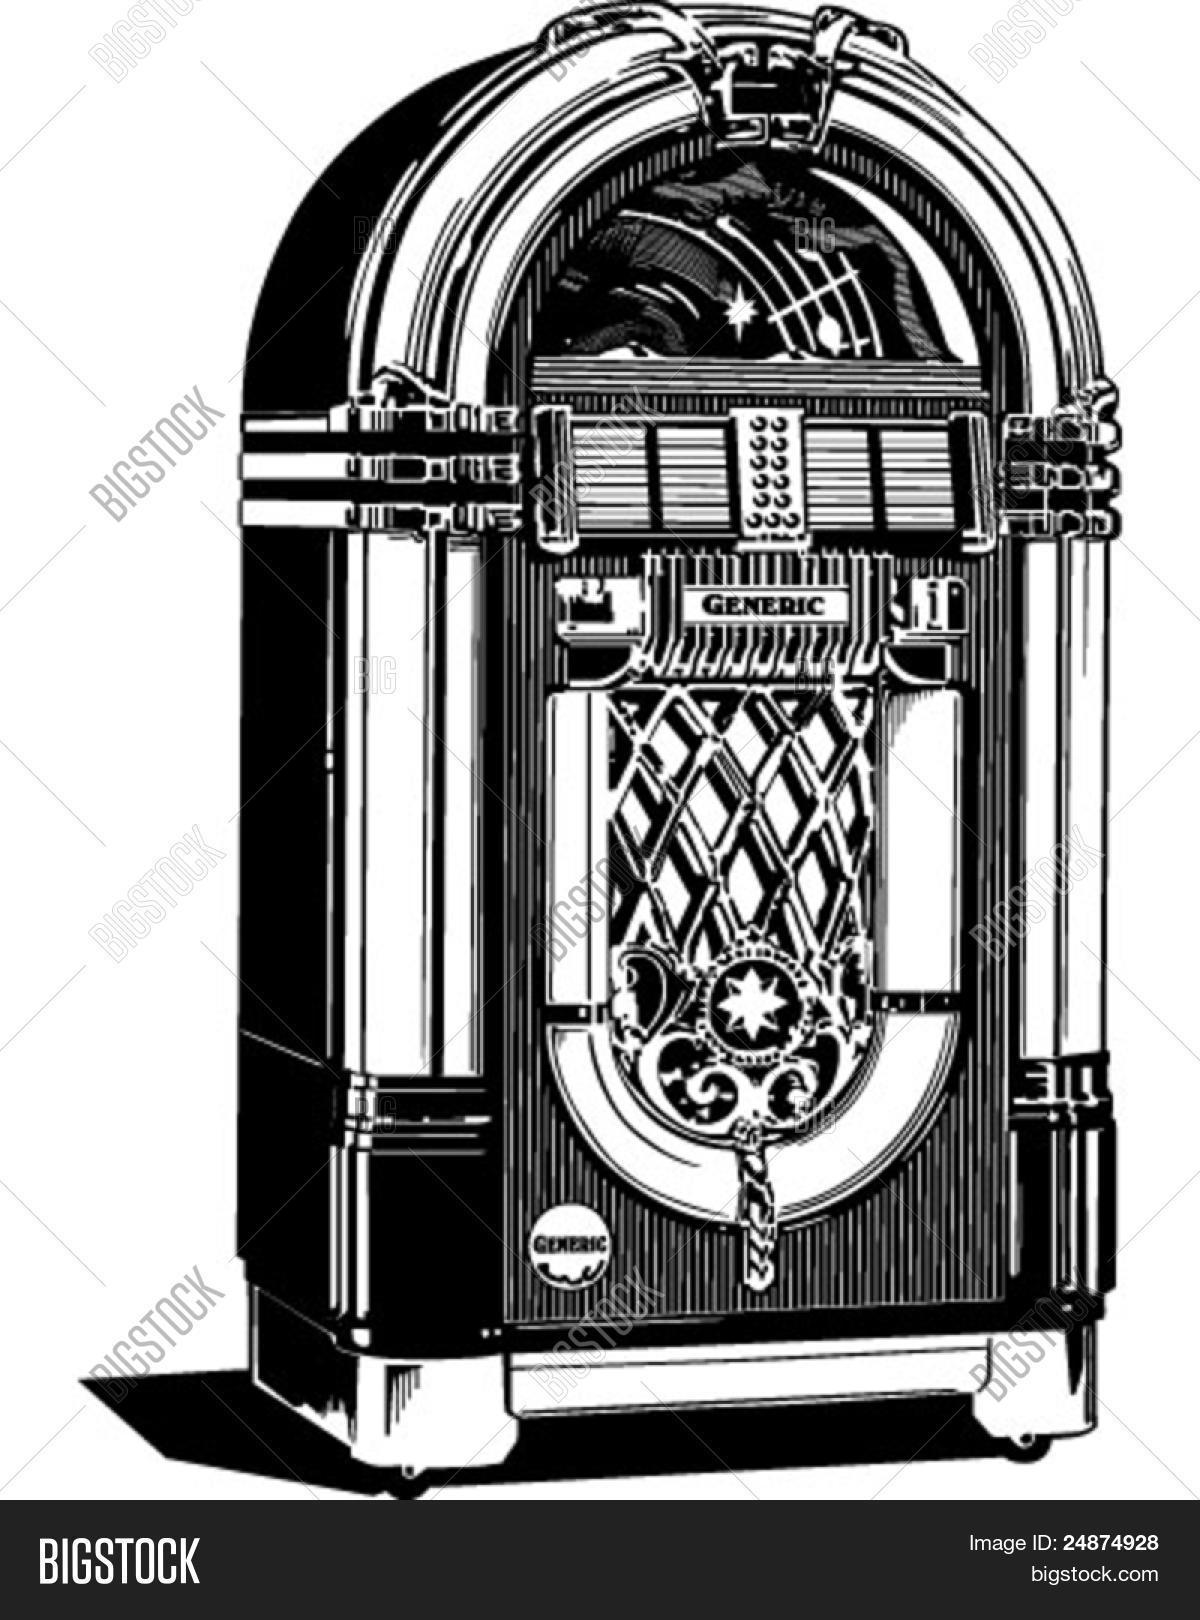 hight resolution of jukebox 2 retro clipart illustration